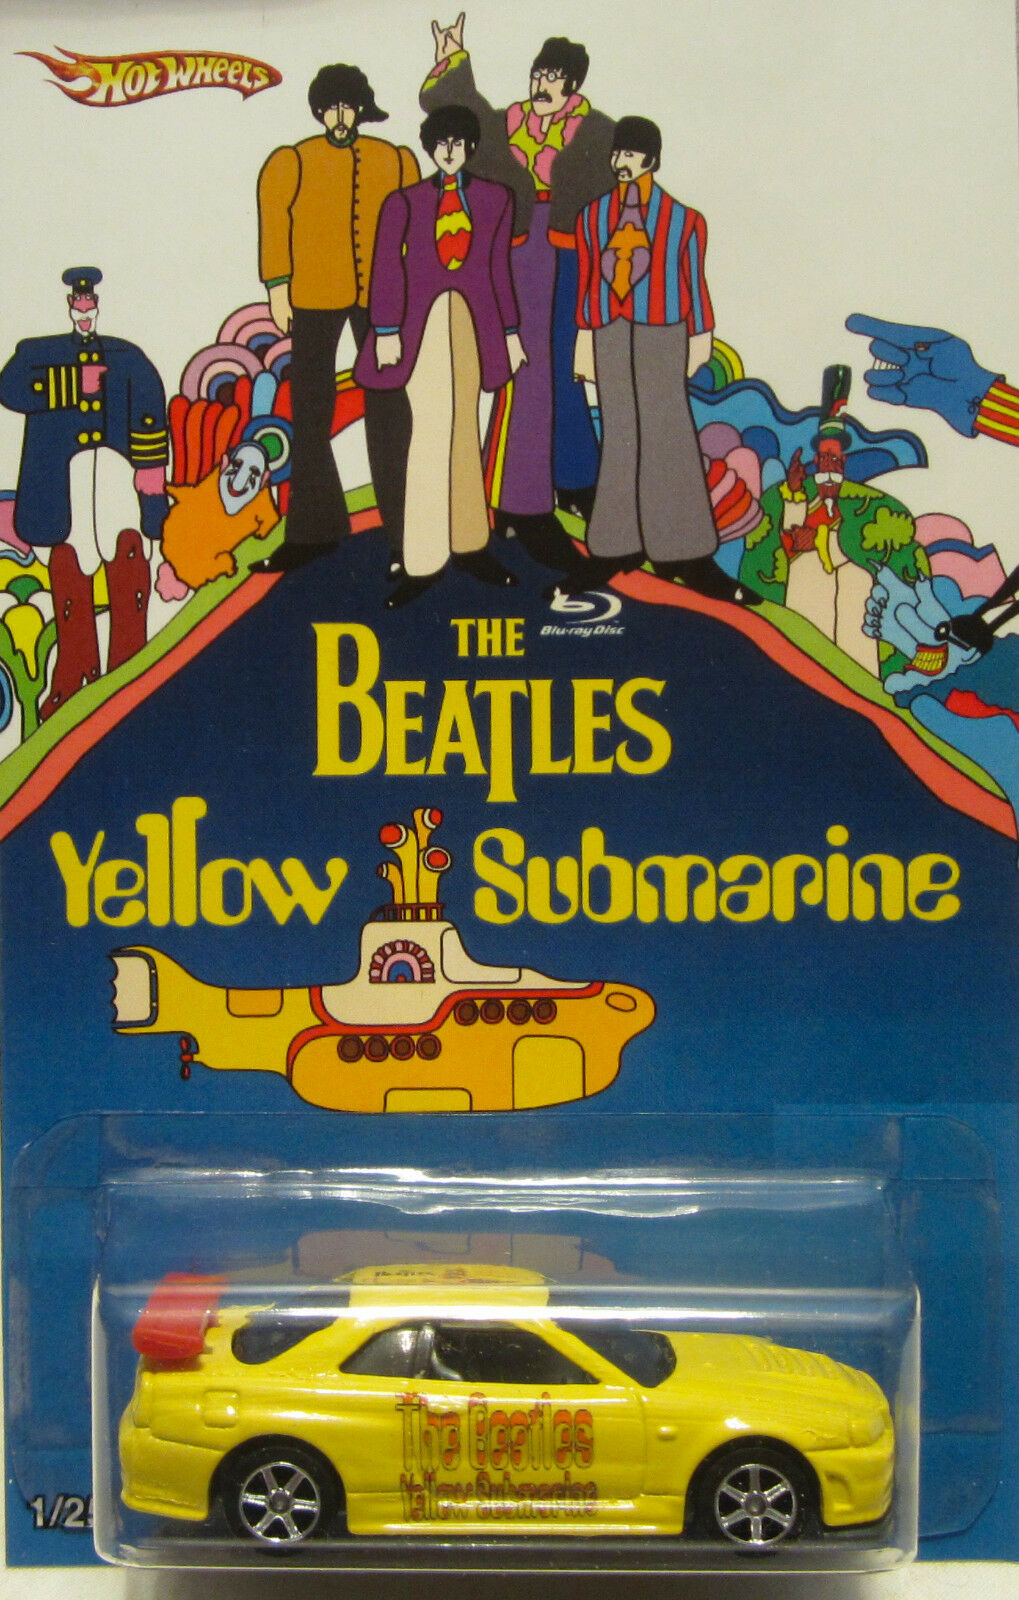 Hot Wheels a Medida Nissan Skyline The Beatles Yellow Submarine Real Riders